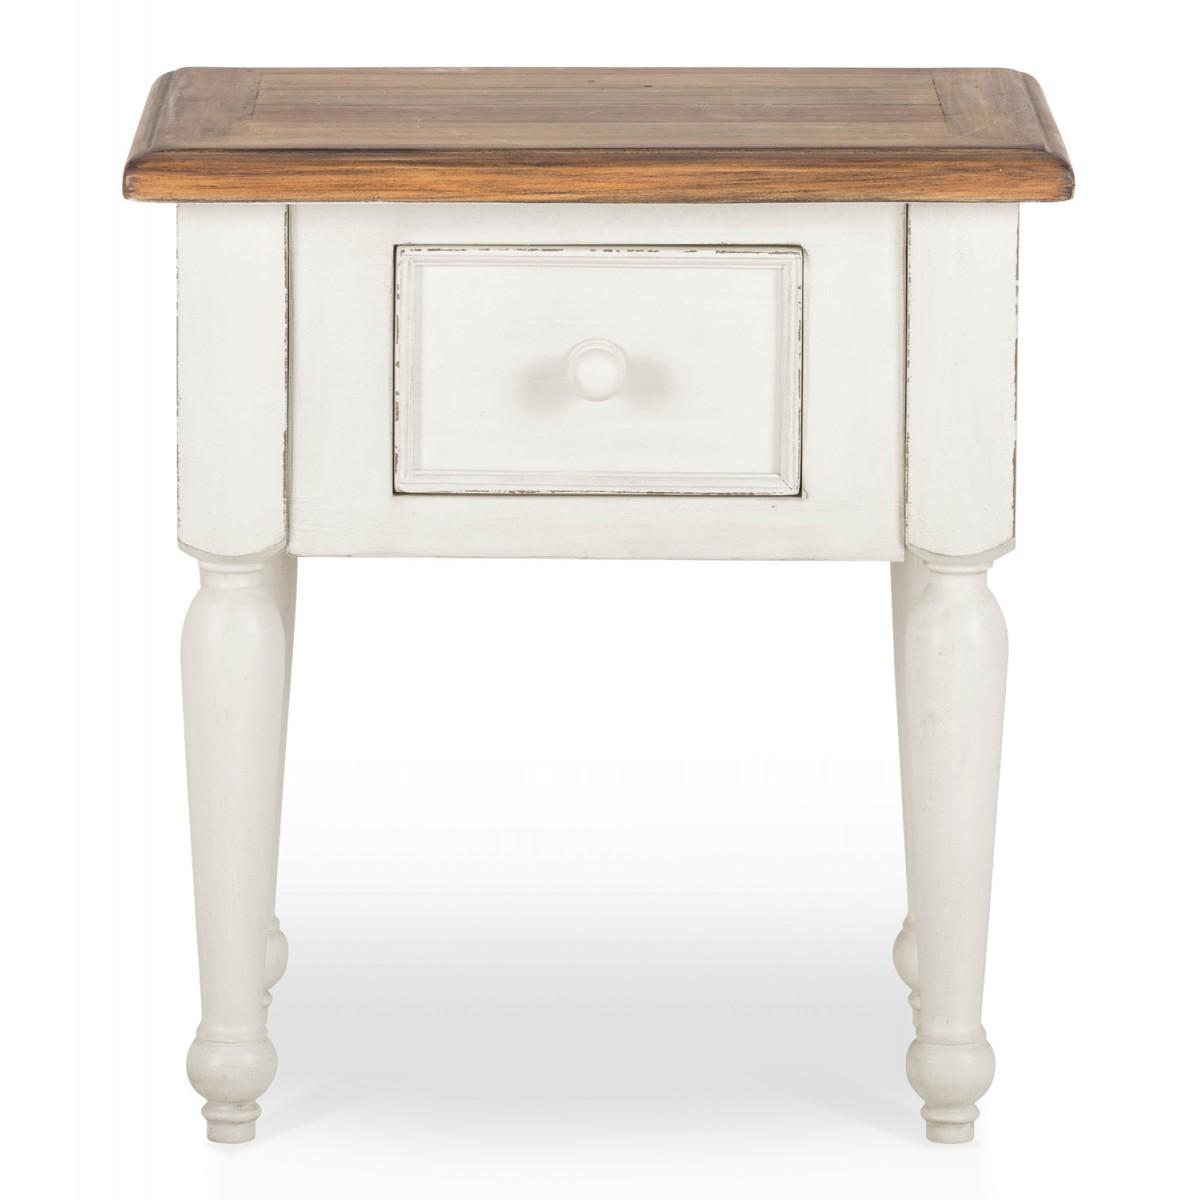 Table de chevet 1 Tiroir Bois Blanc 55x40x60cm